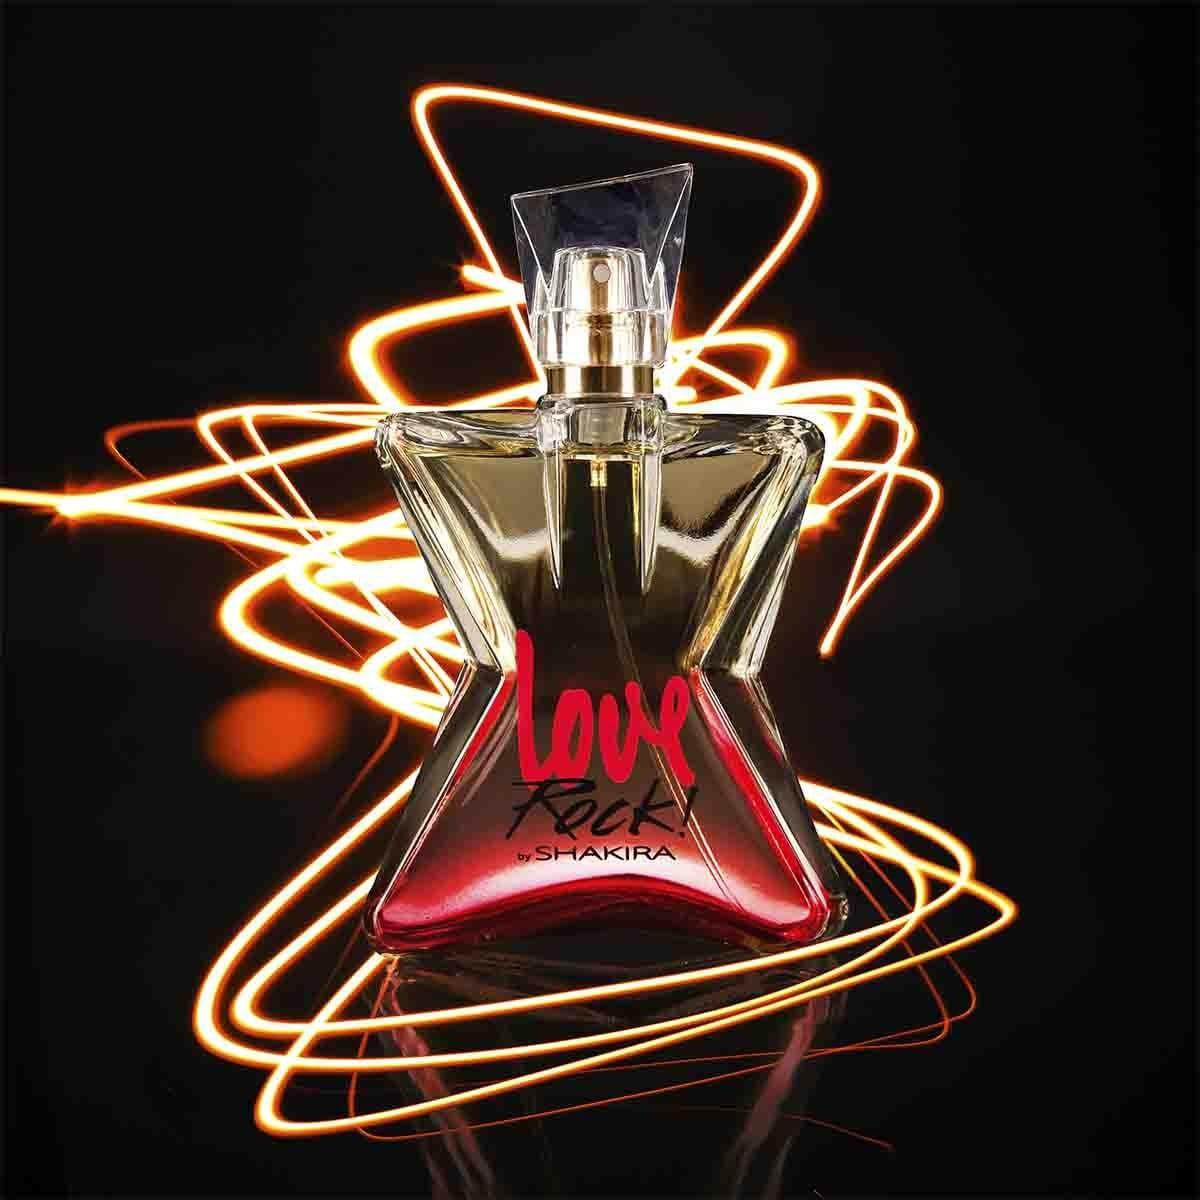 Estuche para Dama Shakira Love Rock Edt 80Ml + Desodorante 150Ml